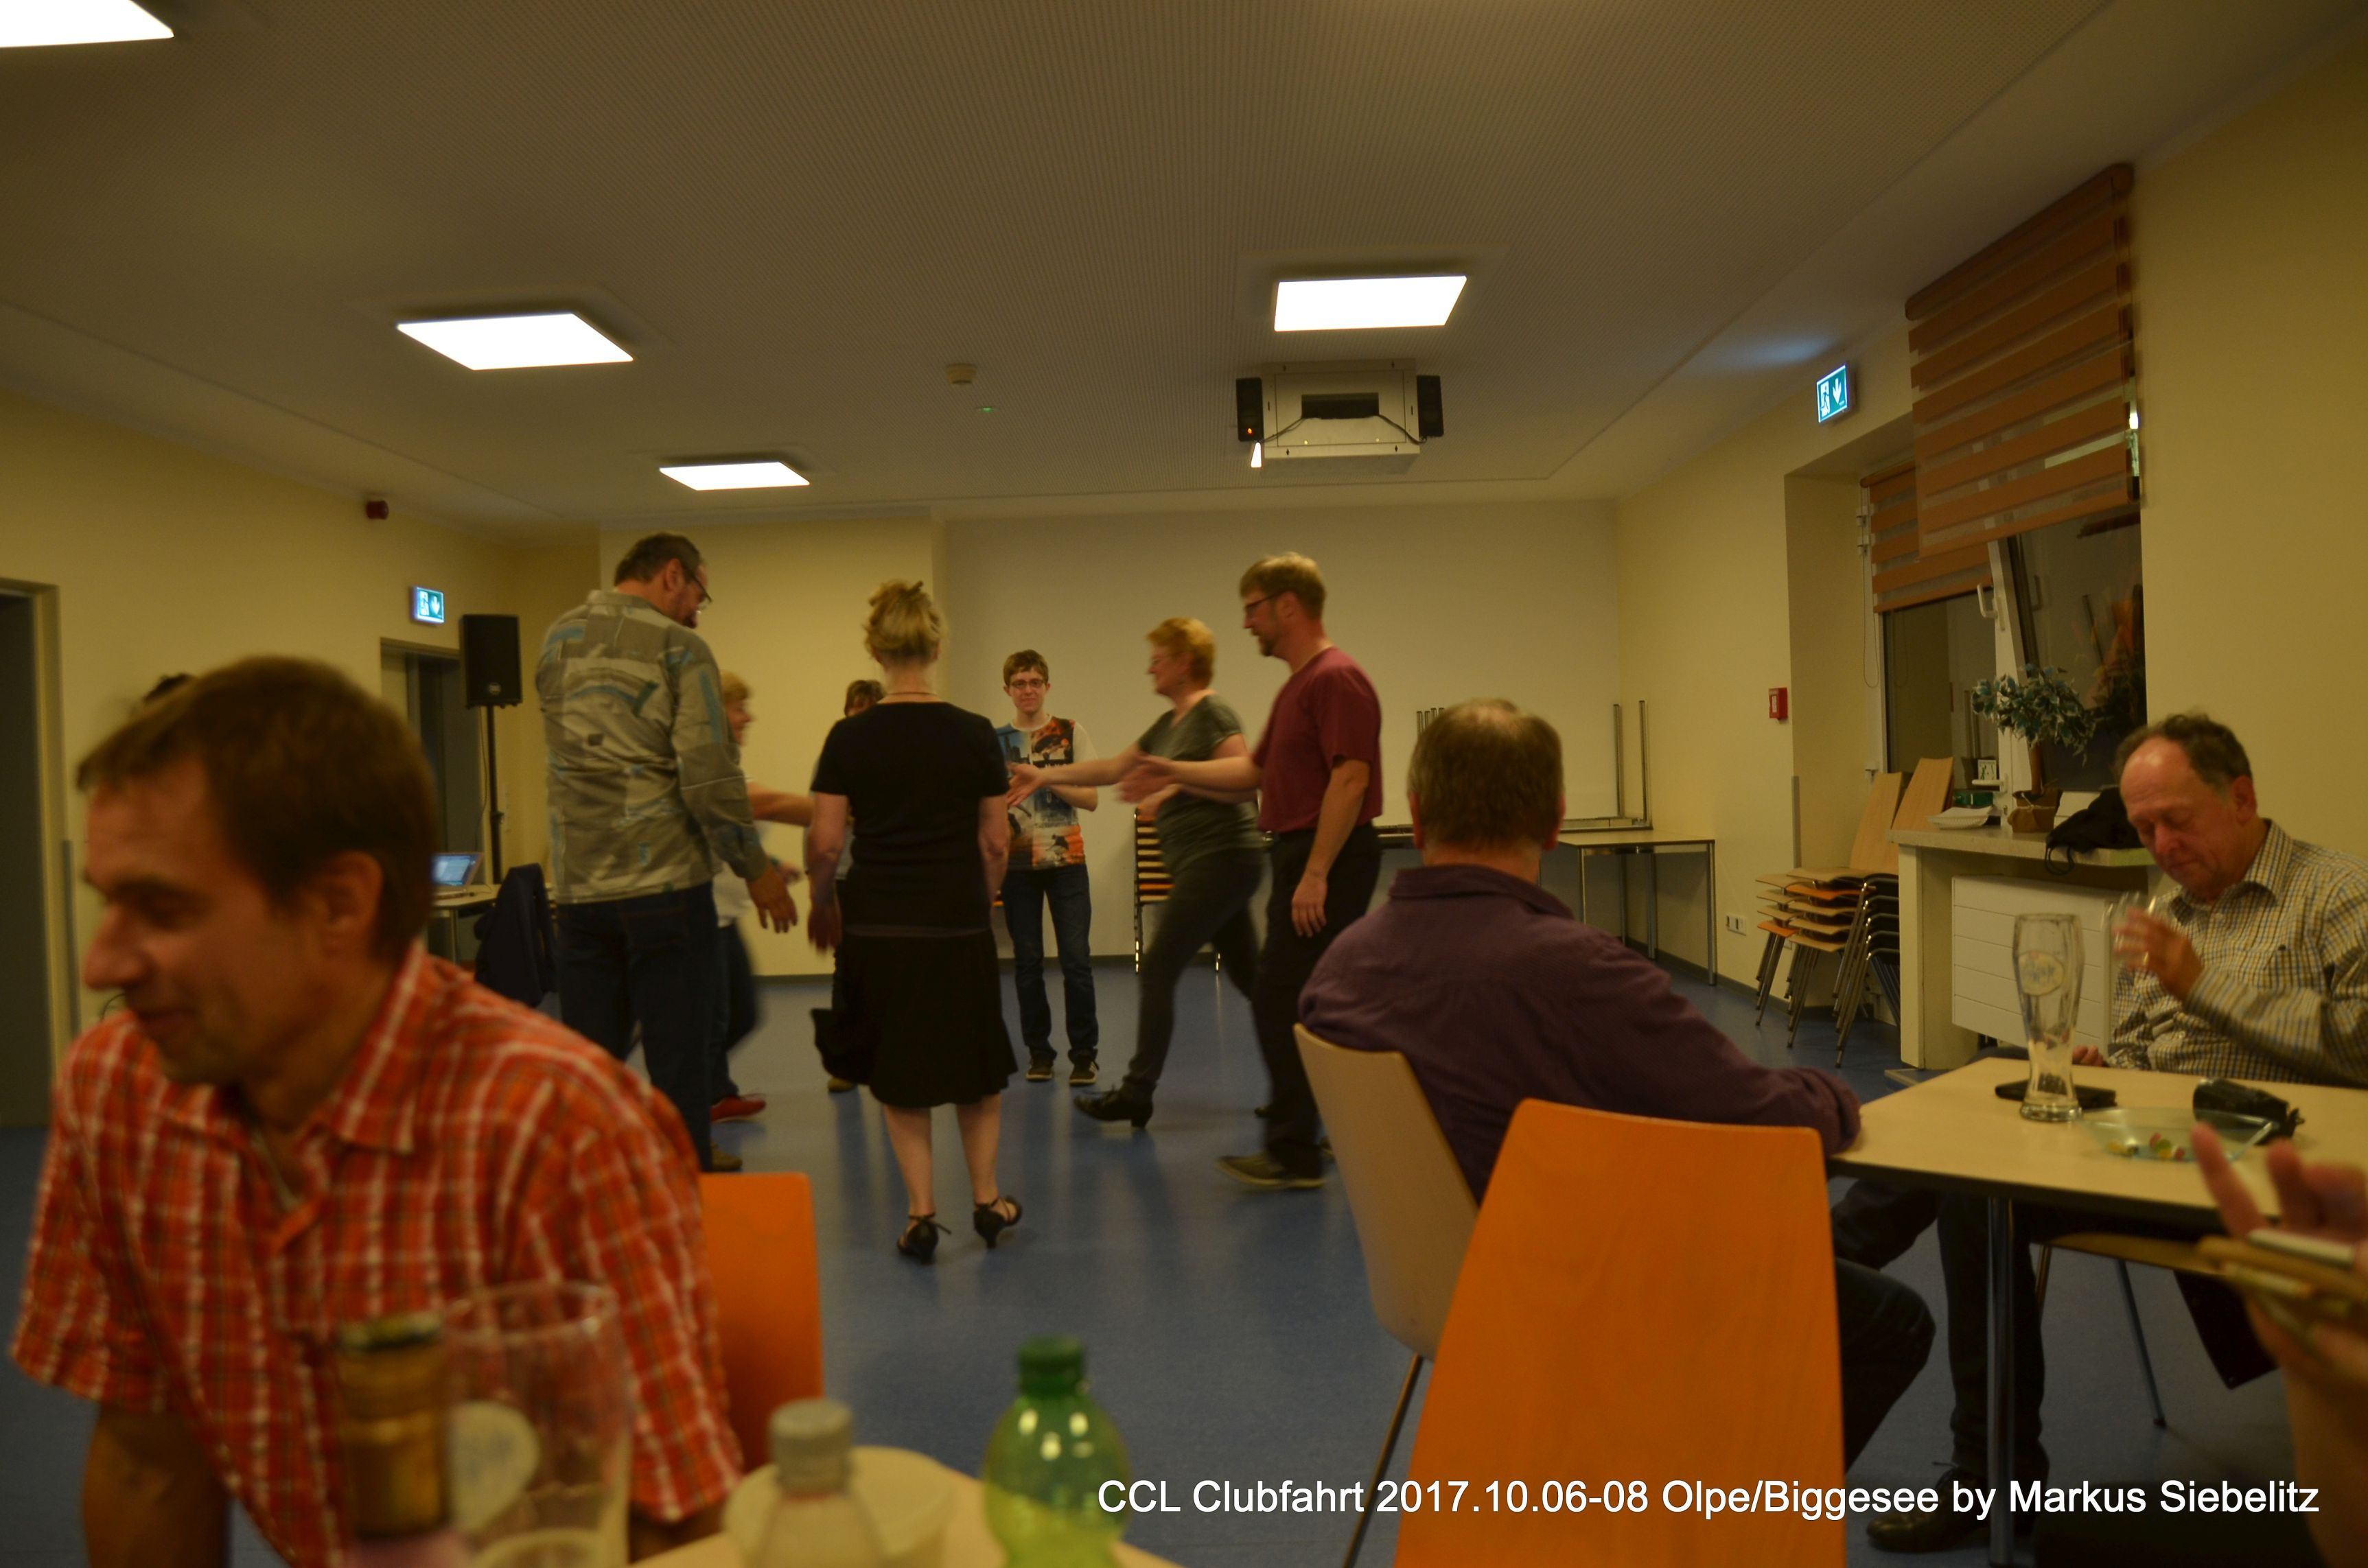 CCL Clubfahrt 2017.10.06-08 Biggesee (18)